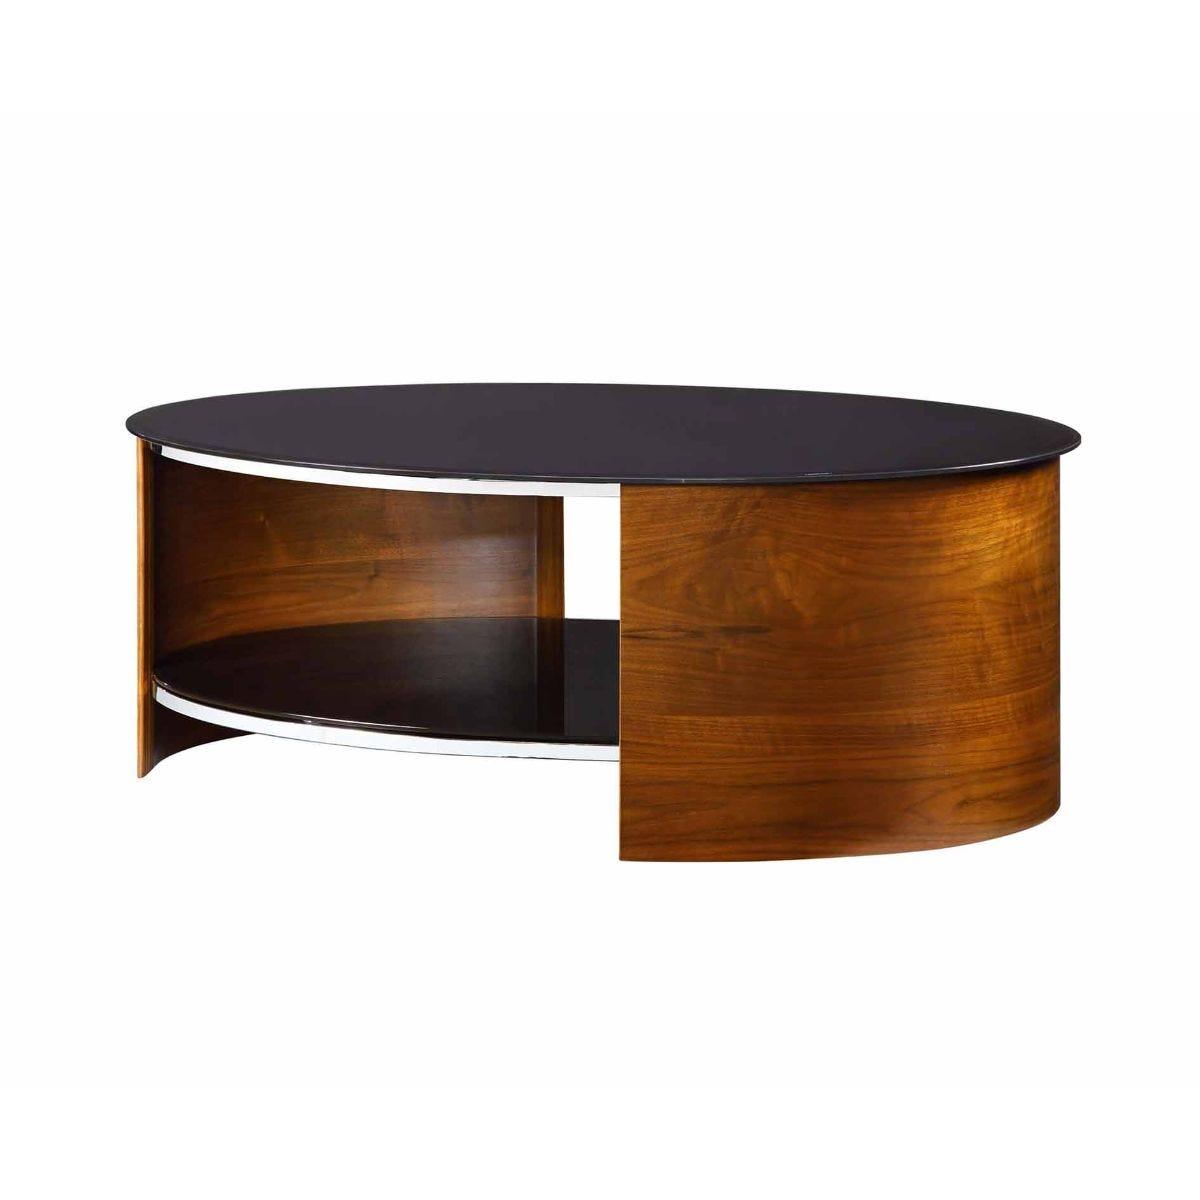 Jual San Marino Oval Coffee Table, Walnut